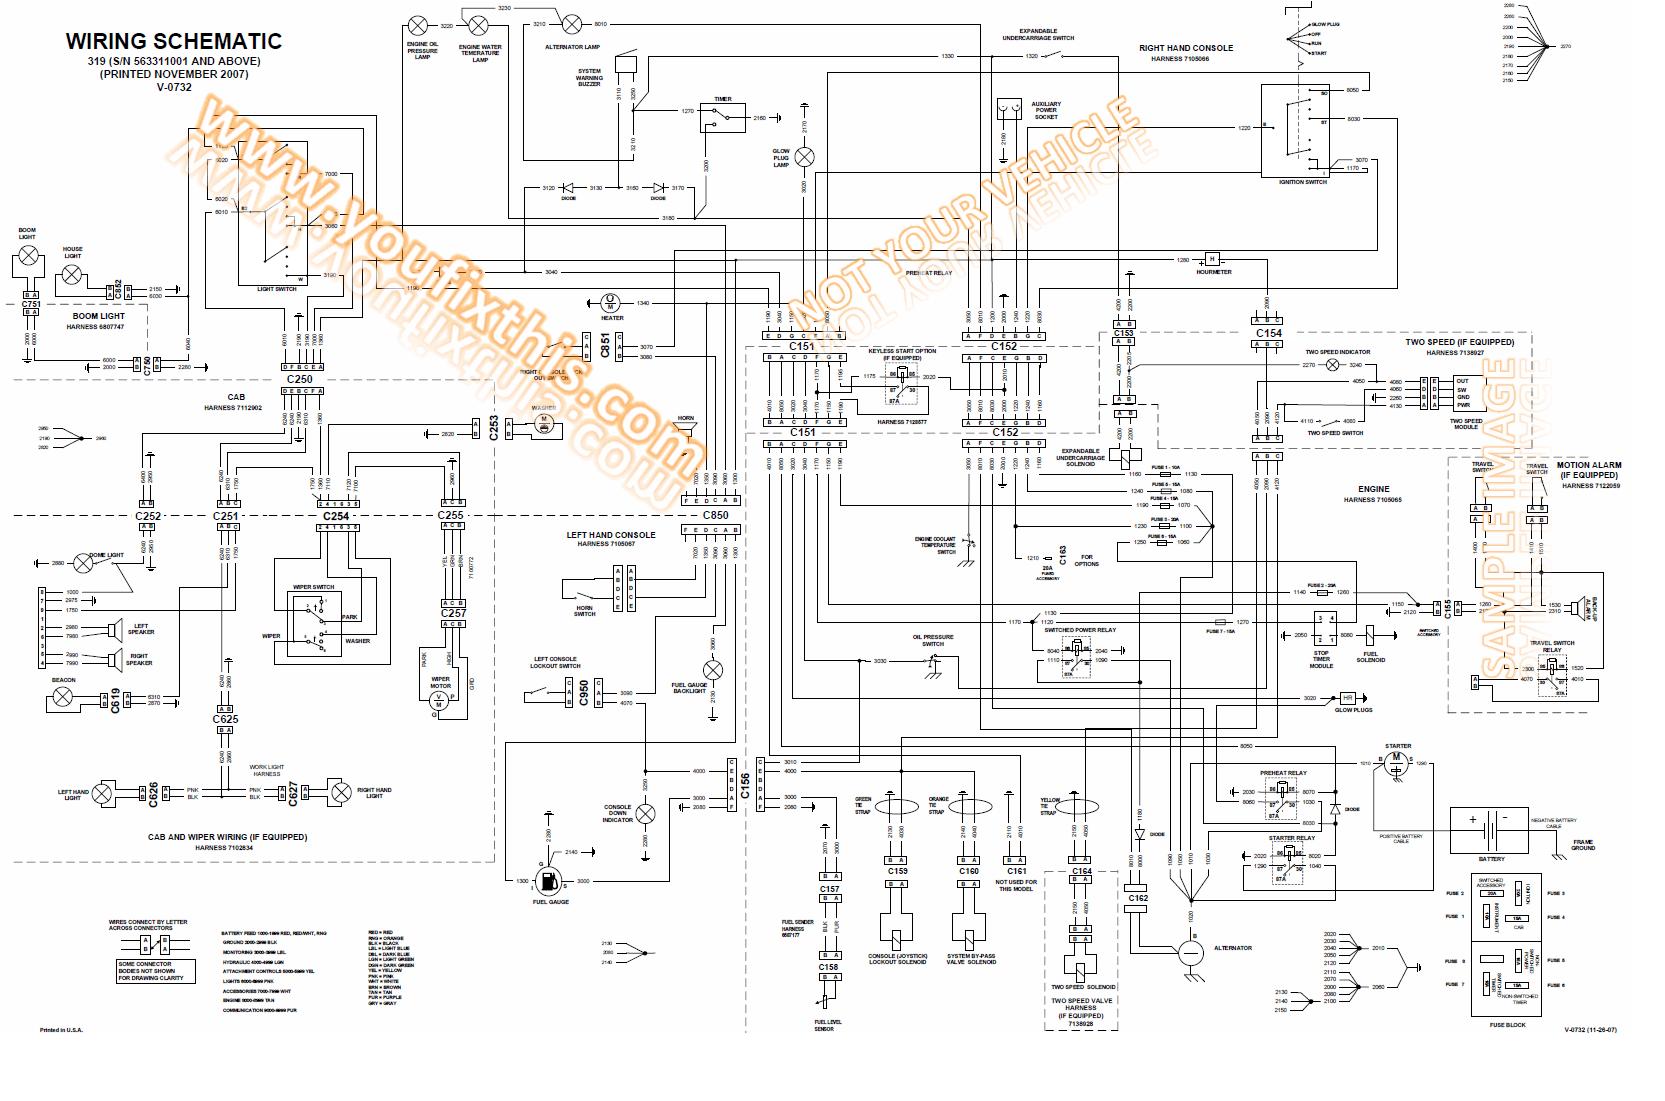 bobcat wiring schematic wiring diagram article  bobcat 773 wiring diagram #14